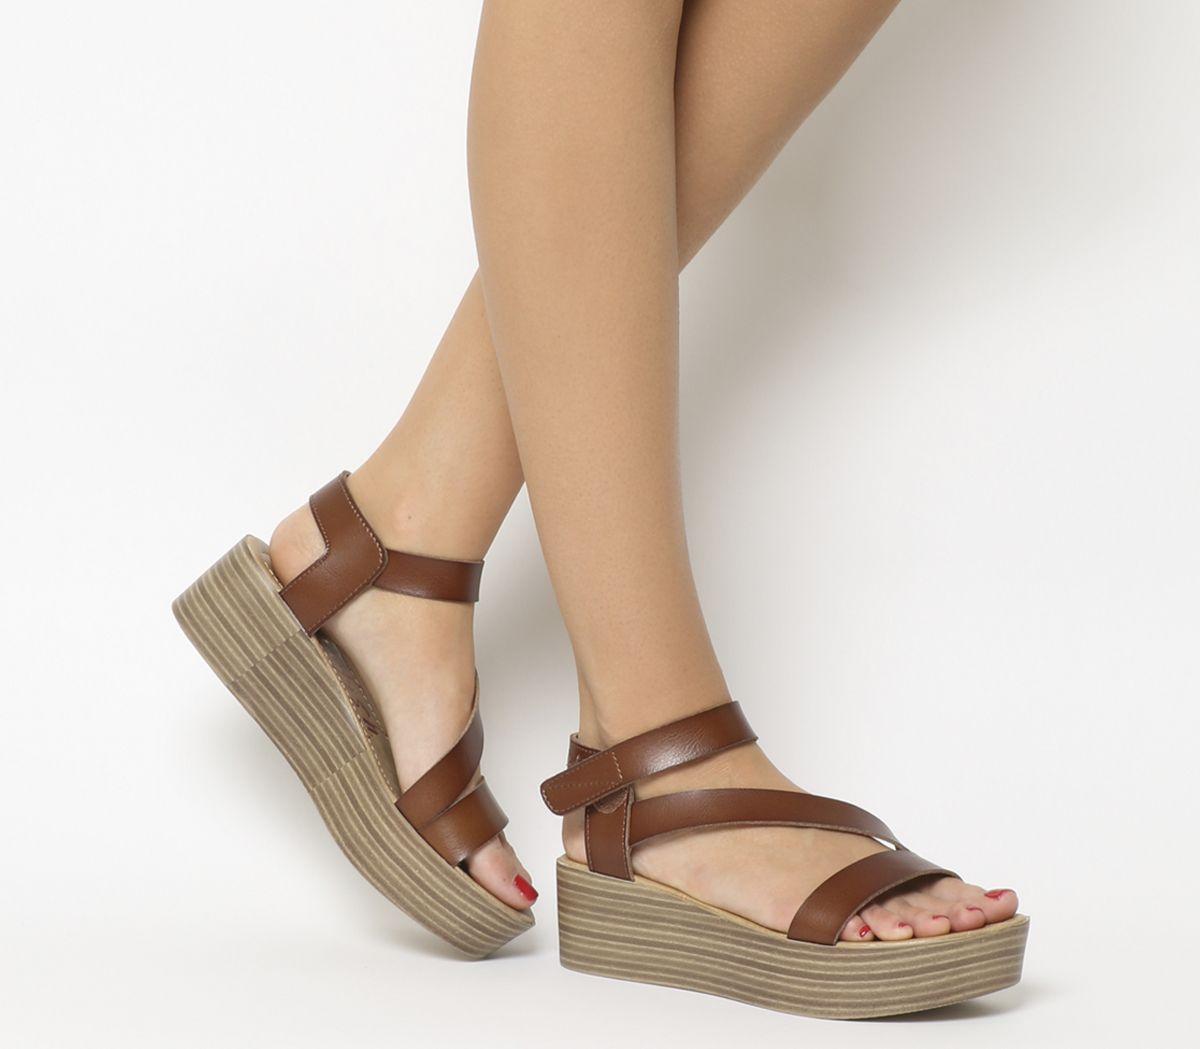 e3a3656592 Blowfish Lover Flatform Sandals Russet Dyecut - Mid Heels